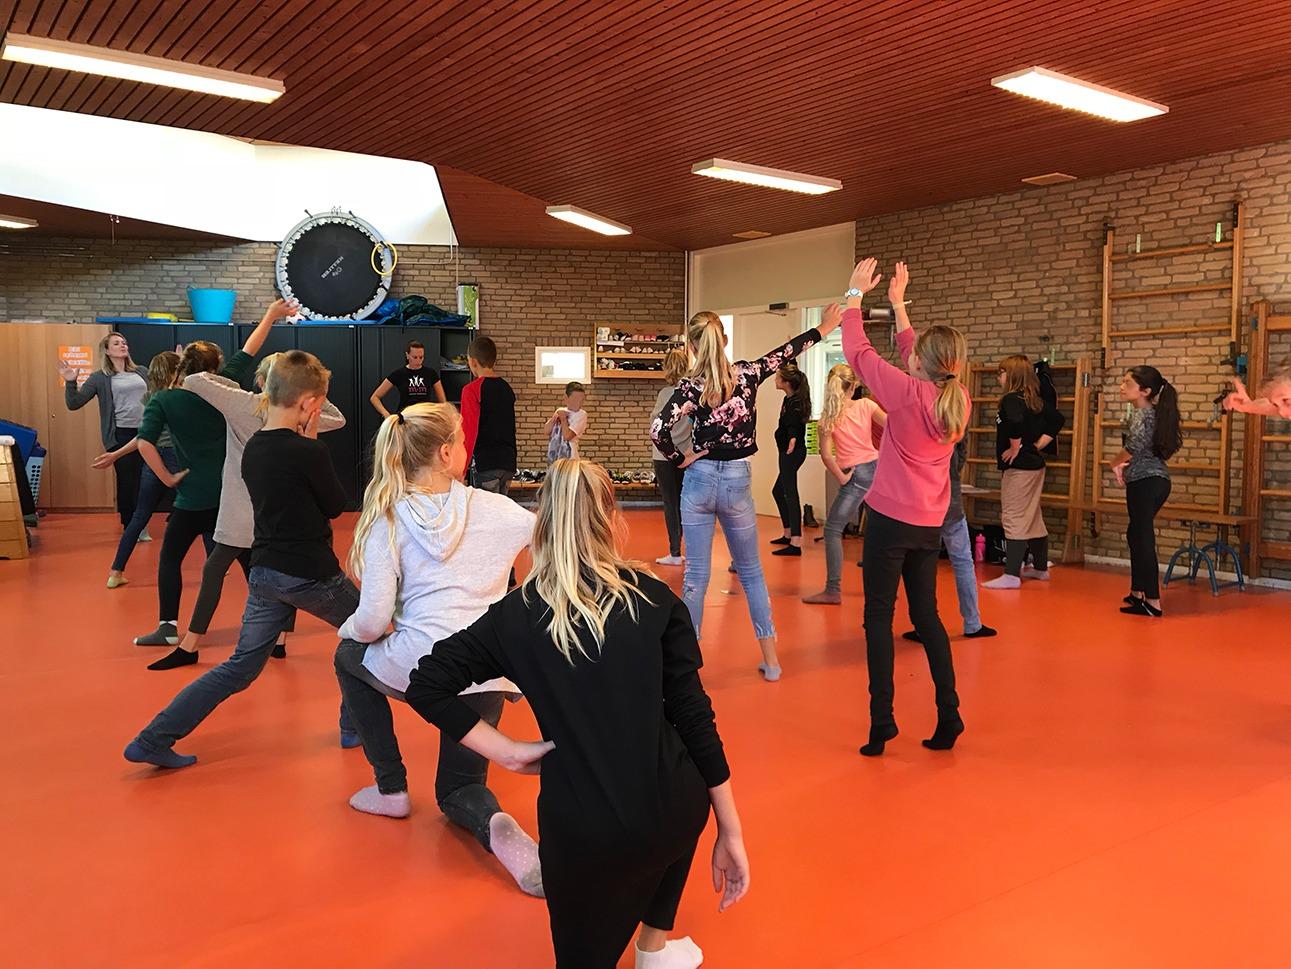 Bewegen op Muziek - Strike a pose - BasisschoolMuziek.nl